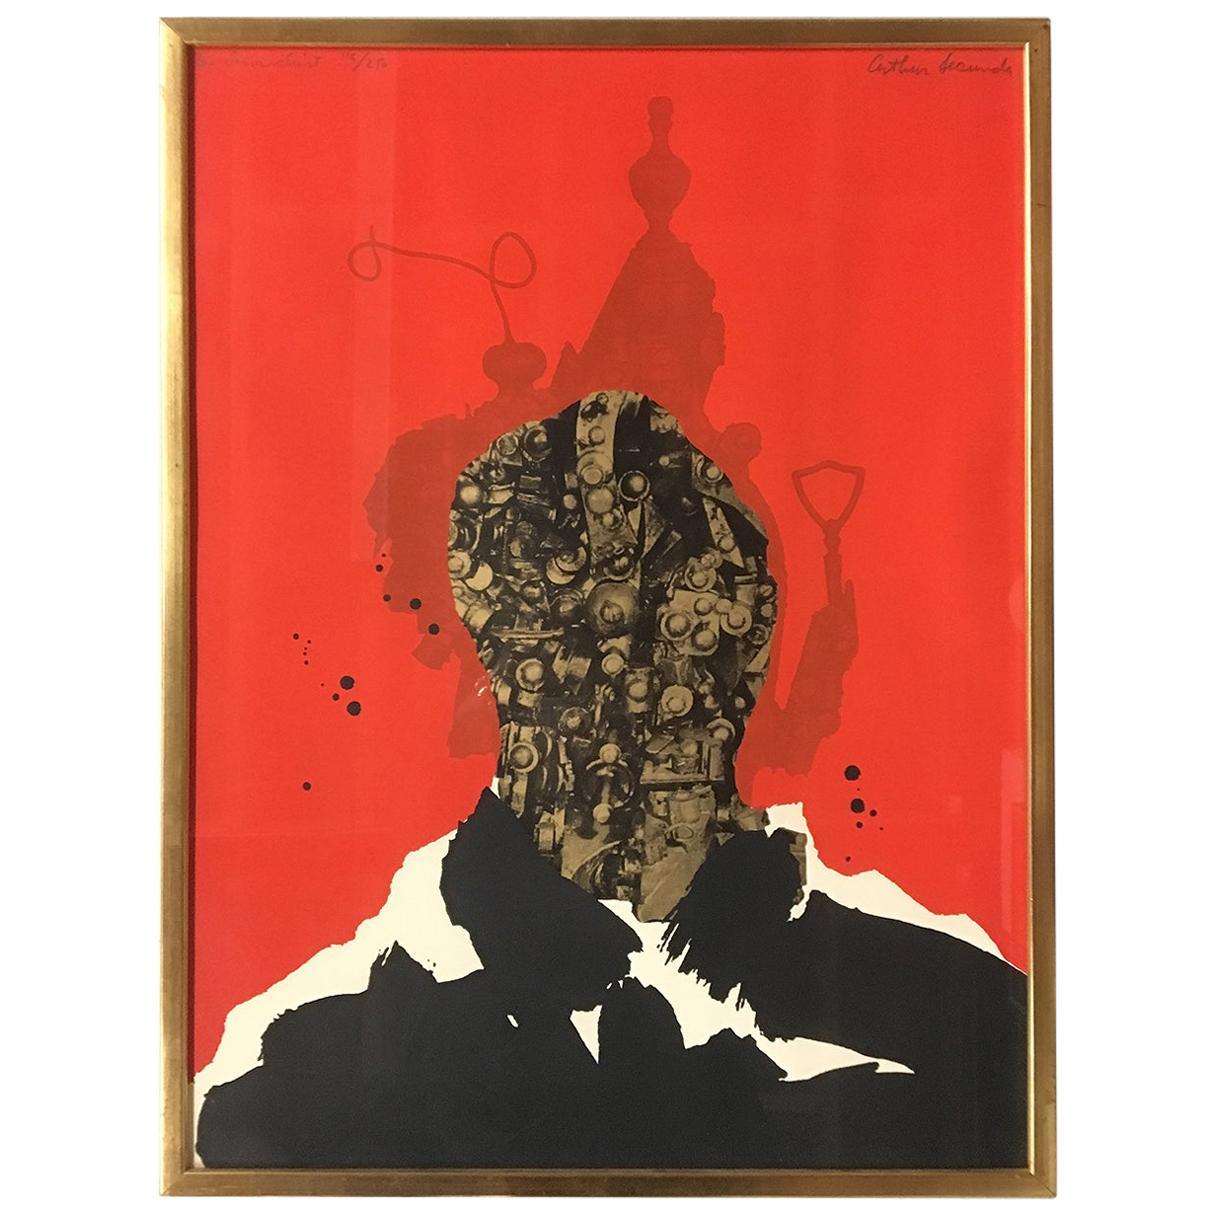 1960s Limited Edition Silkscreen Print 'The Anarchist' by Arthur Secunda